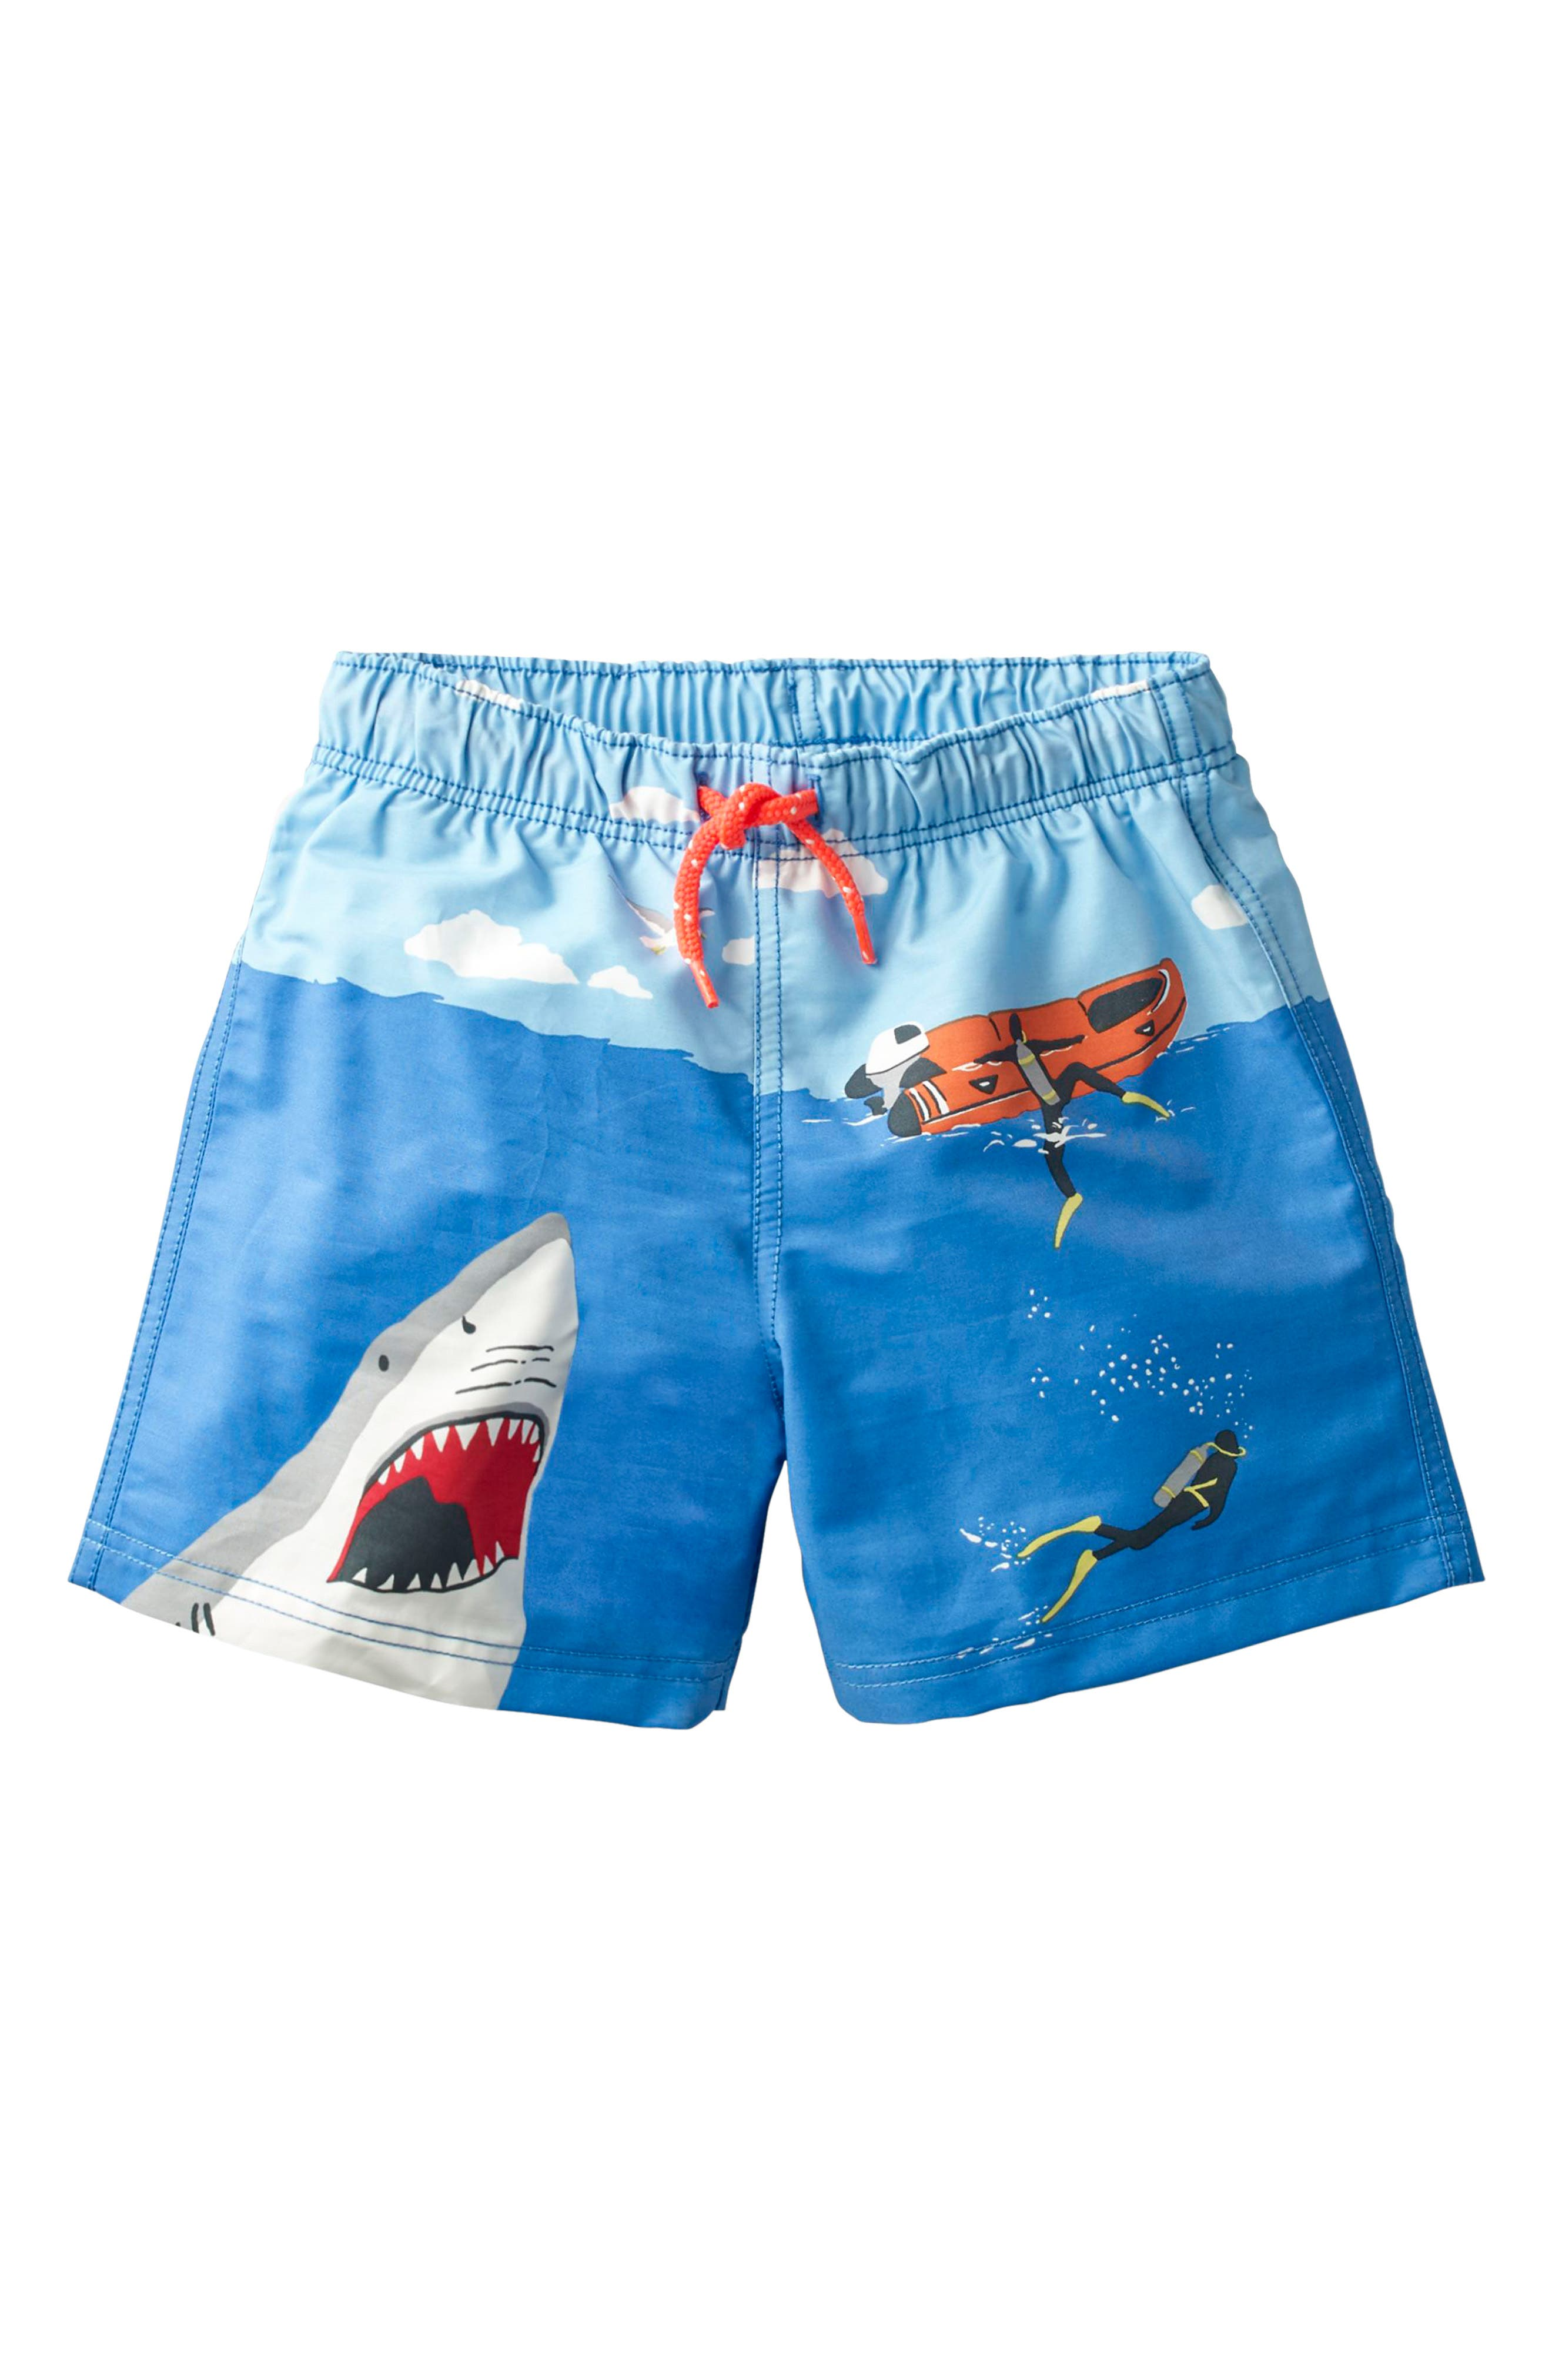 Bathers Shark Swim Trunks,                         Main,                         color, Skipper Blue Shark Attack